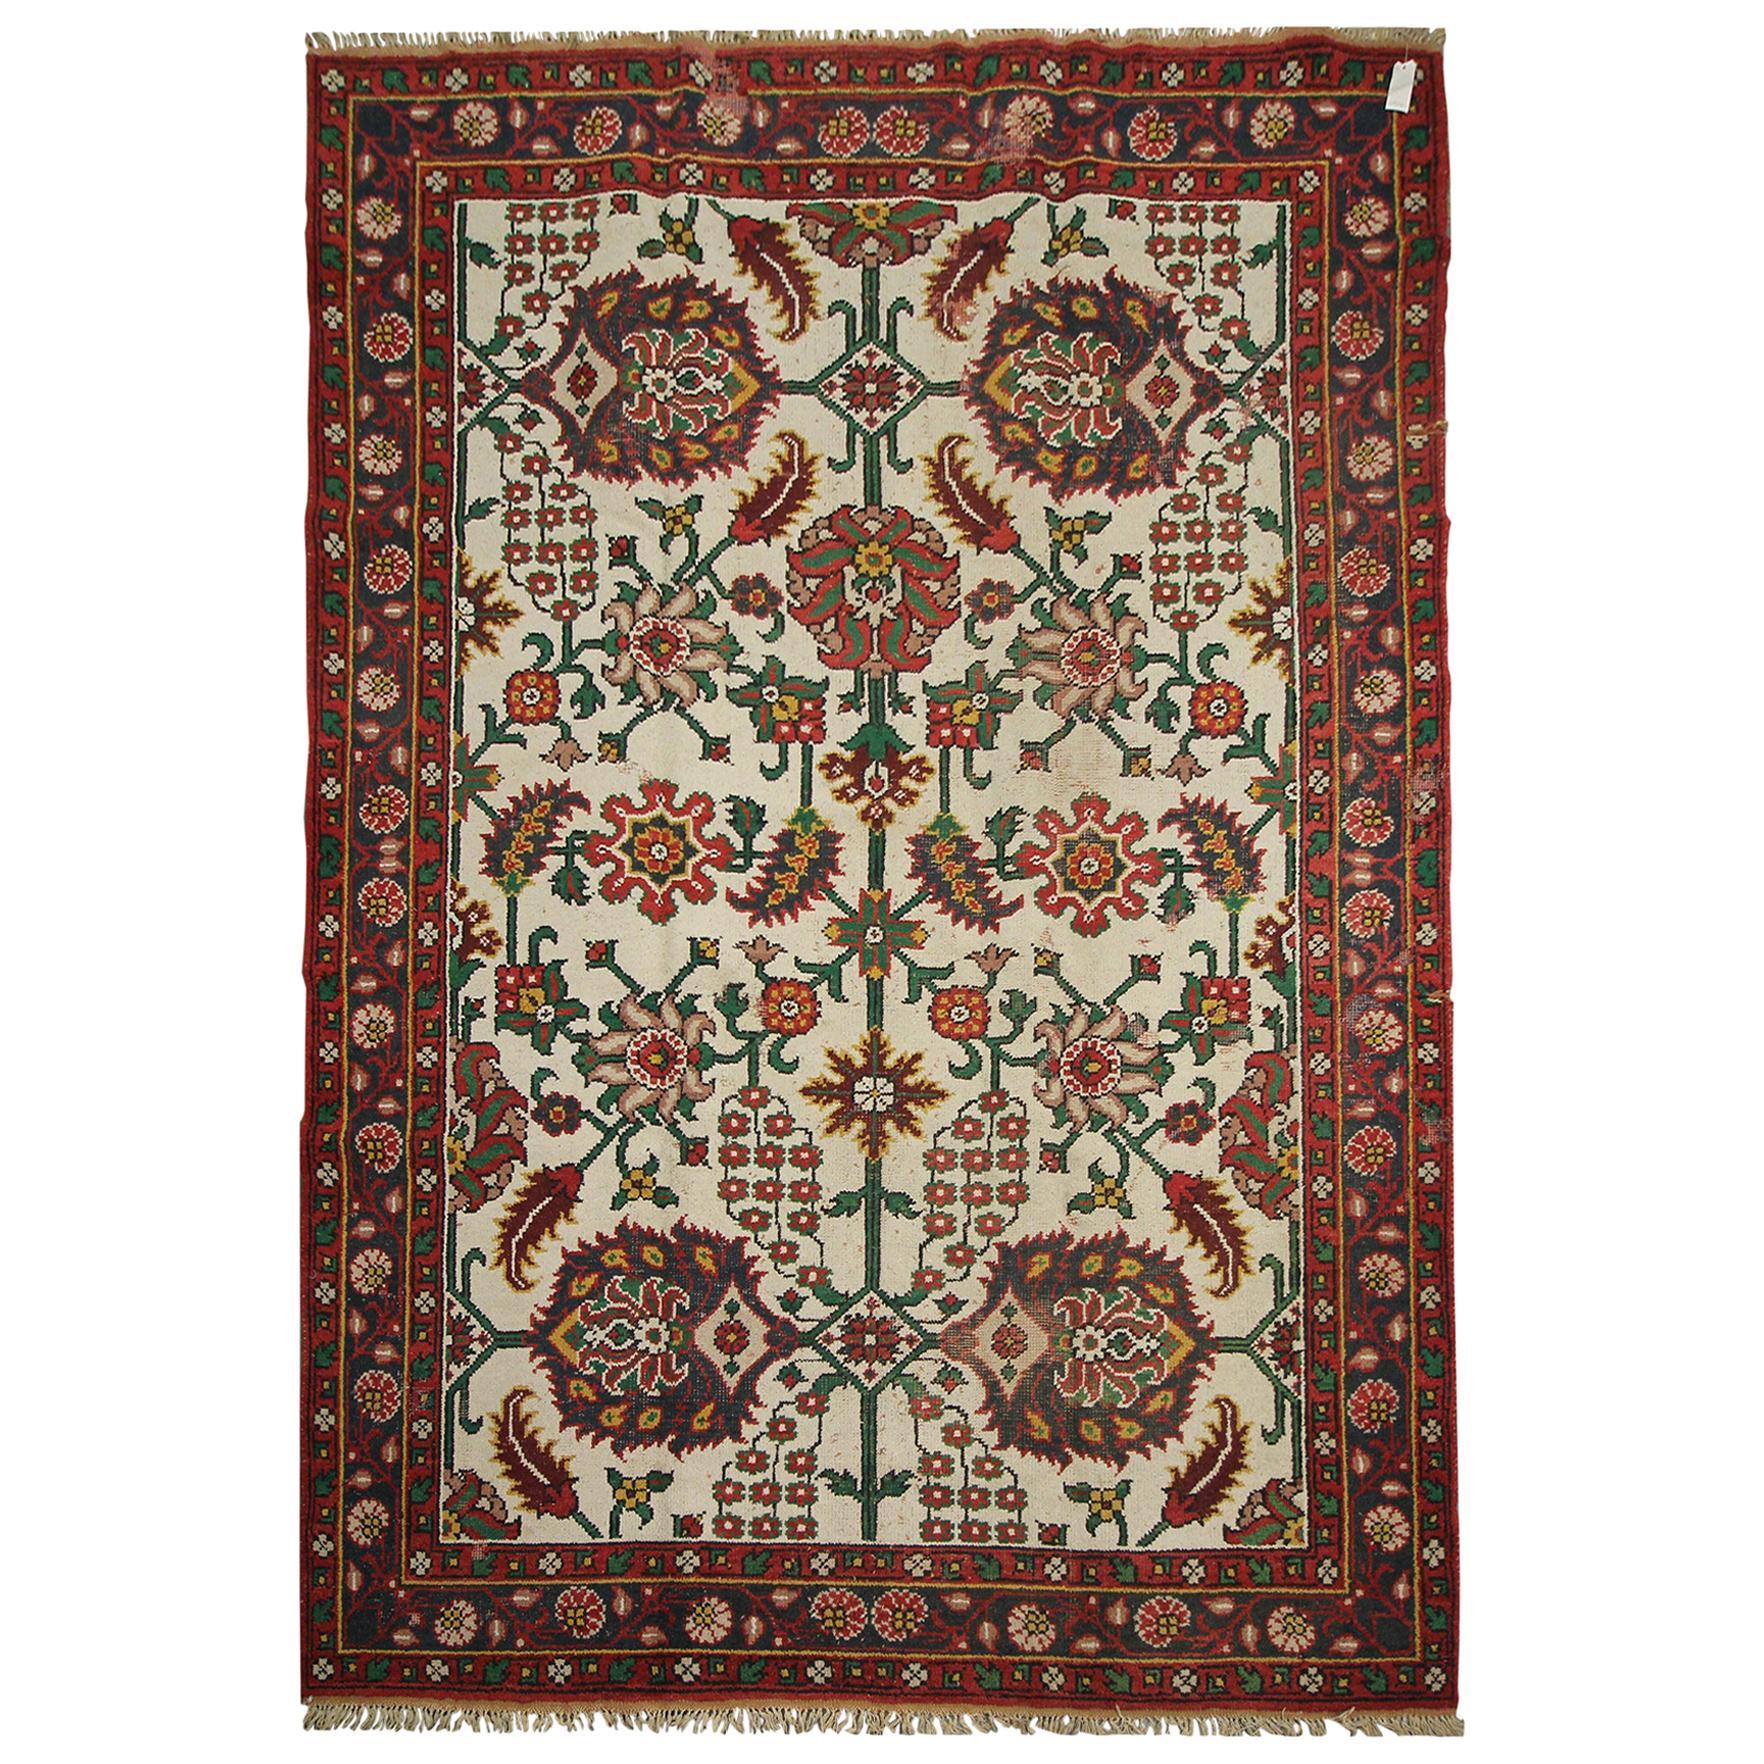 Large Indian Rug Handwoven Wool Oriental Carpet